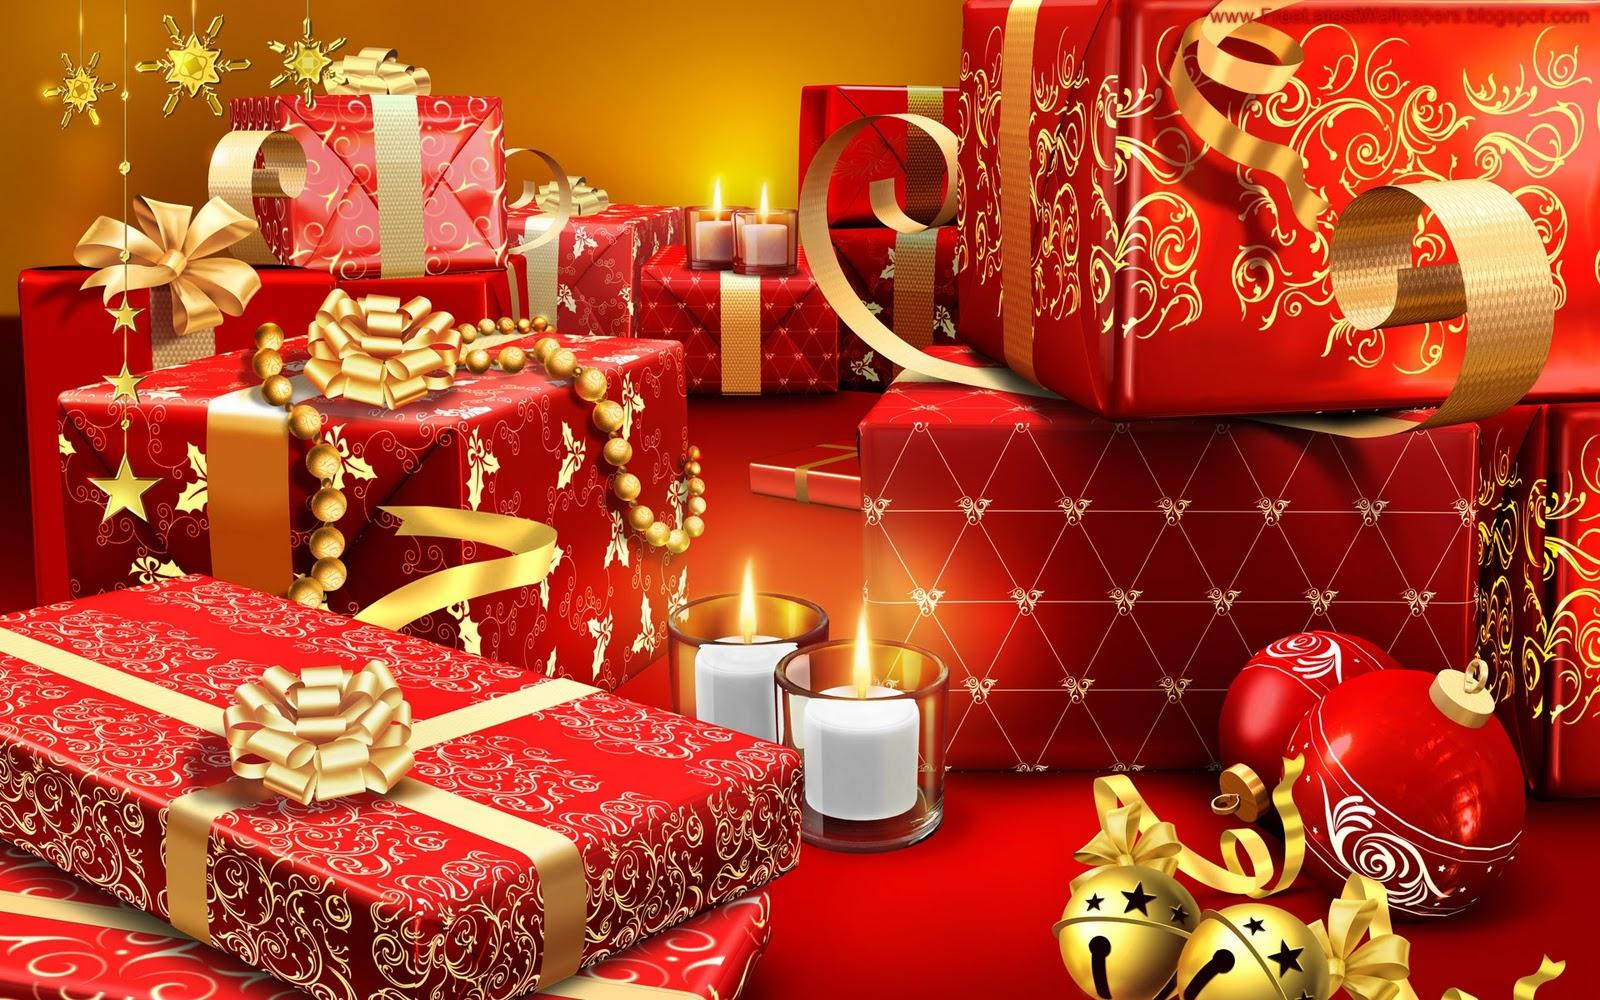 http://4.bp.blogspot.com/_4ScUb_jMfWs/TPIZwHuMLeI/AAAAAAAAAAU/4p9k7rVqdpM/s1600/Christmas+HD+Wallpapers+1920x1200+%25281%2529.jpg